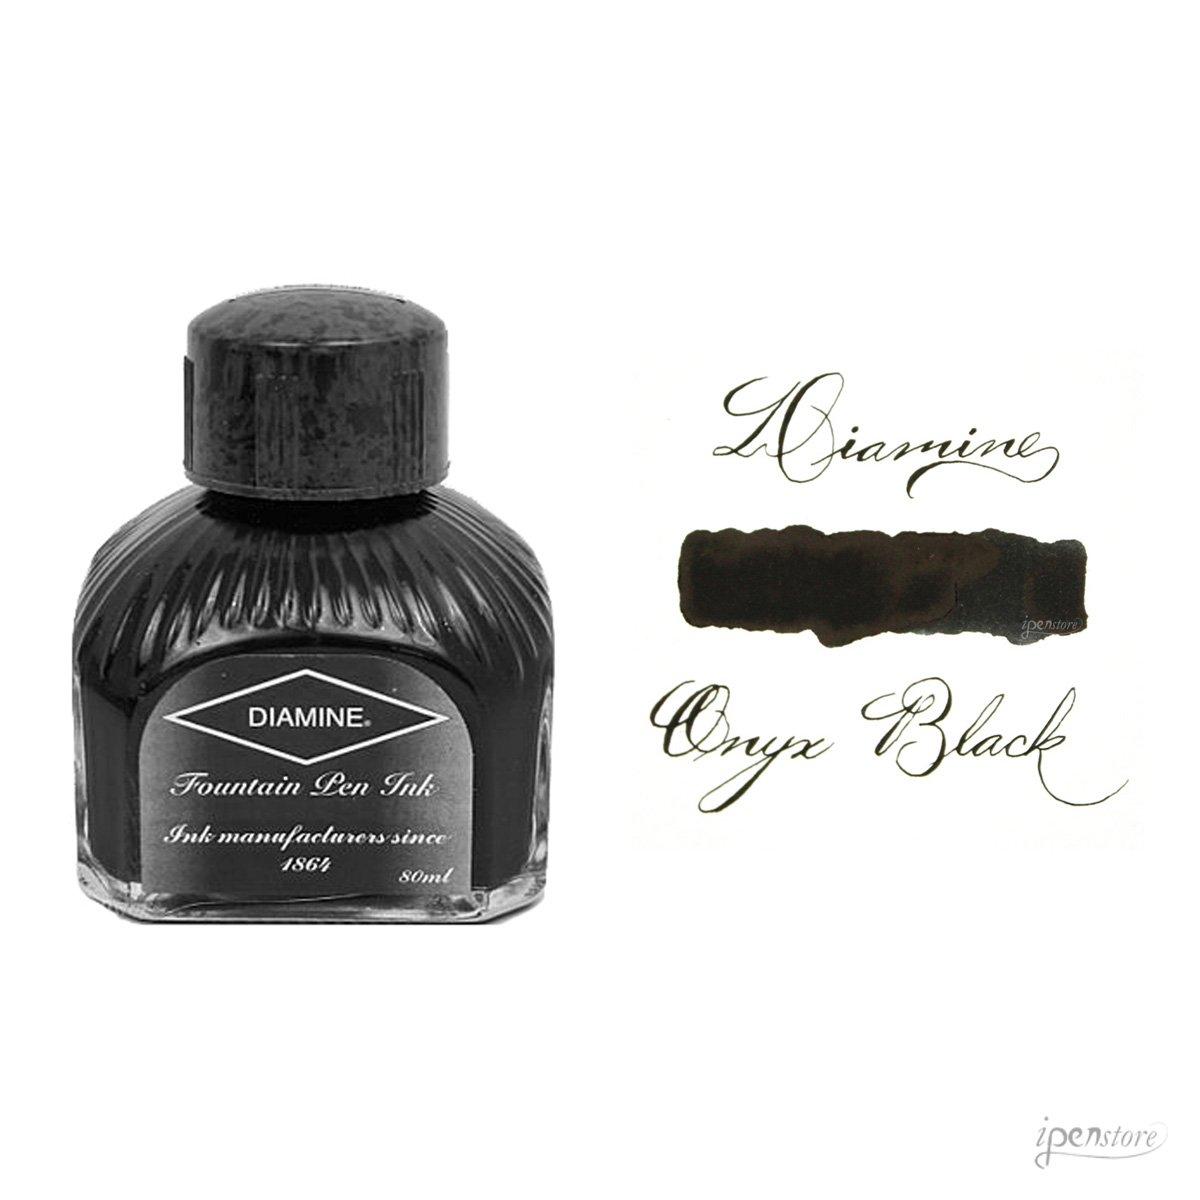 Diamine Fountain Pen Ink - 80 ml - Onyx Black by Diamine (Image #1)